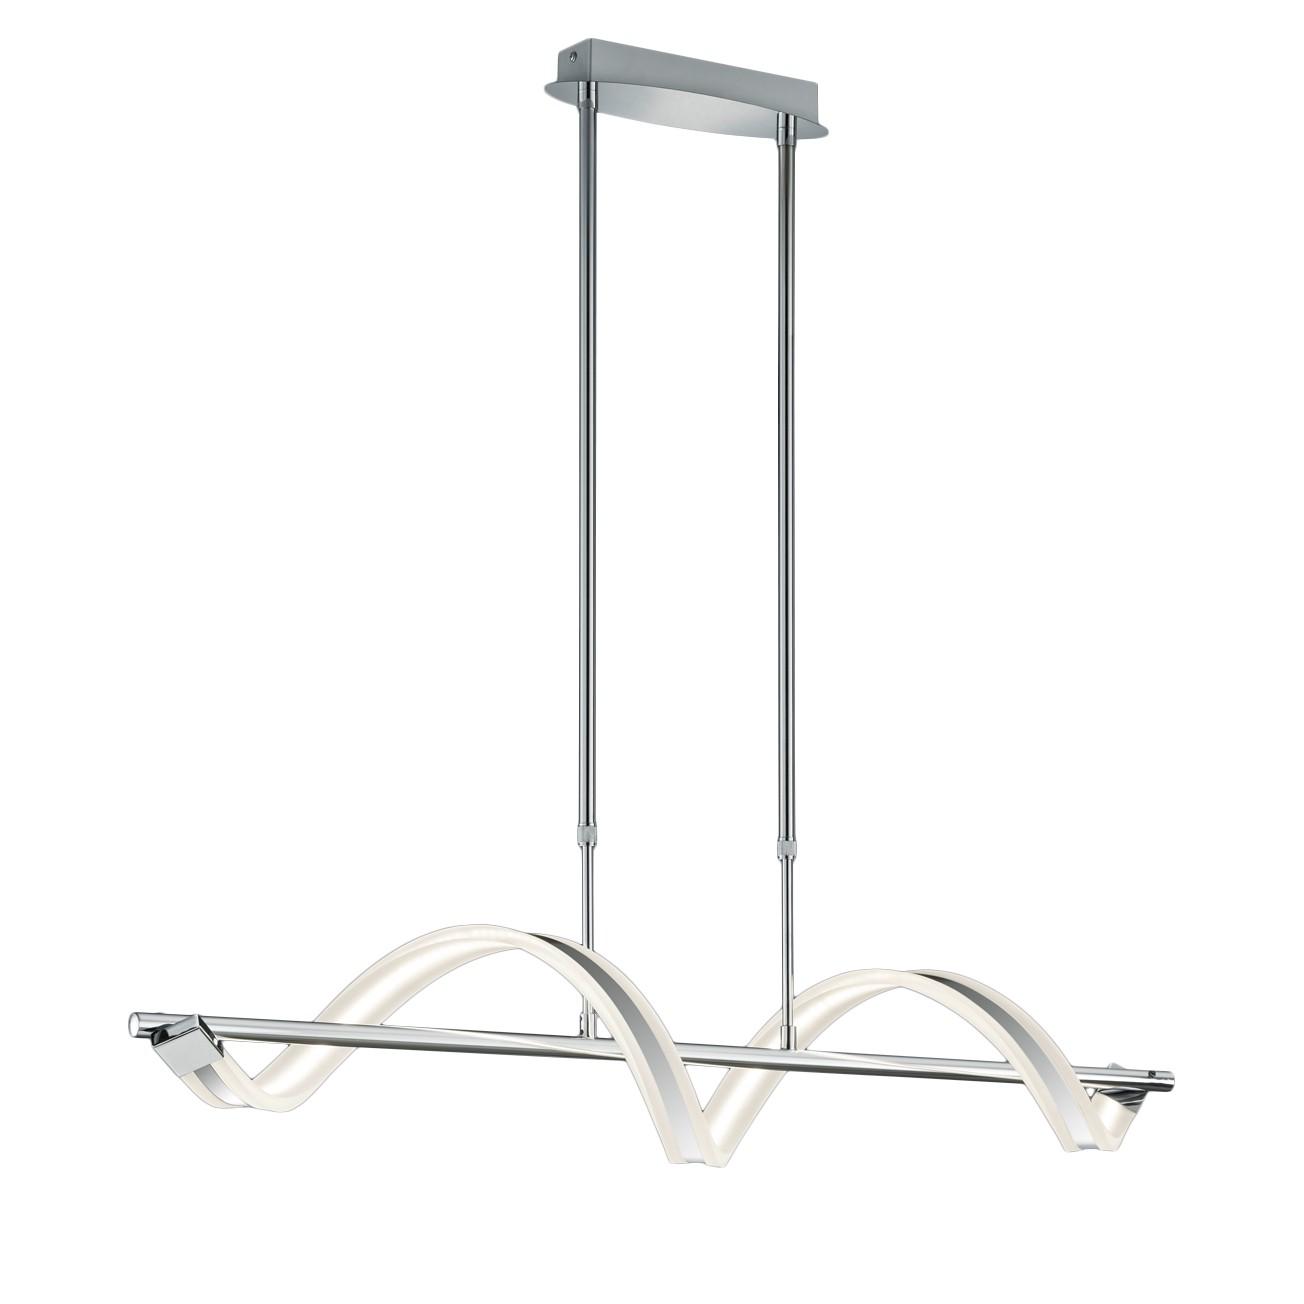 energie  A+, LED-hanglamp Sydney - plexiglas/metaal - 1 lichtbron, Trio